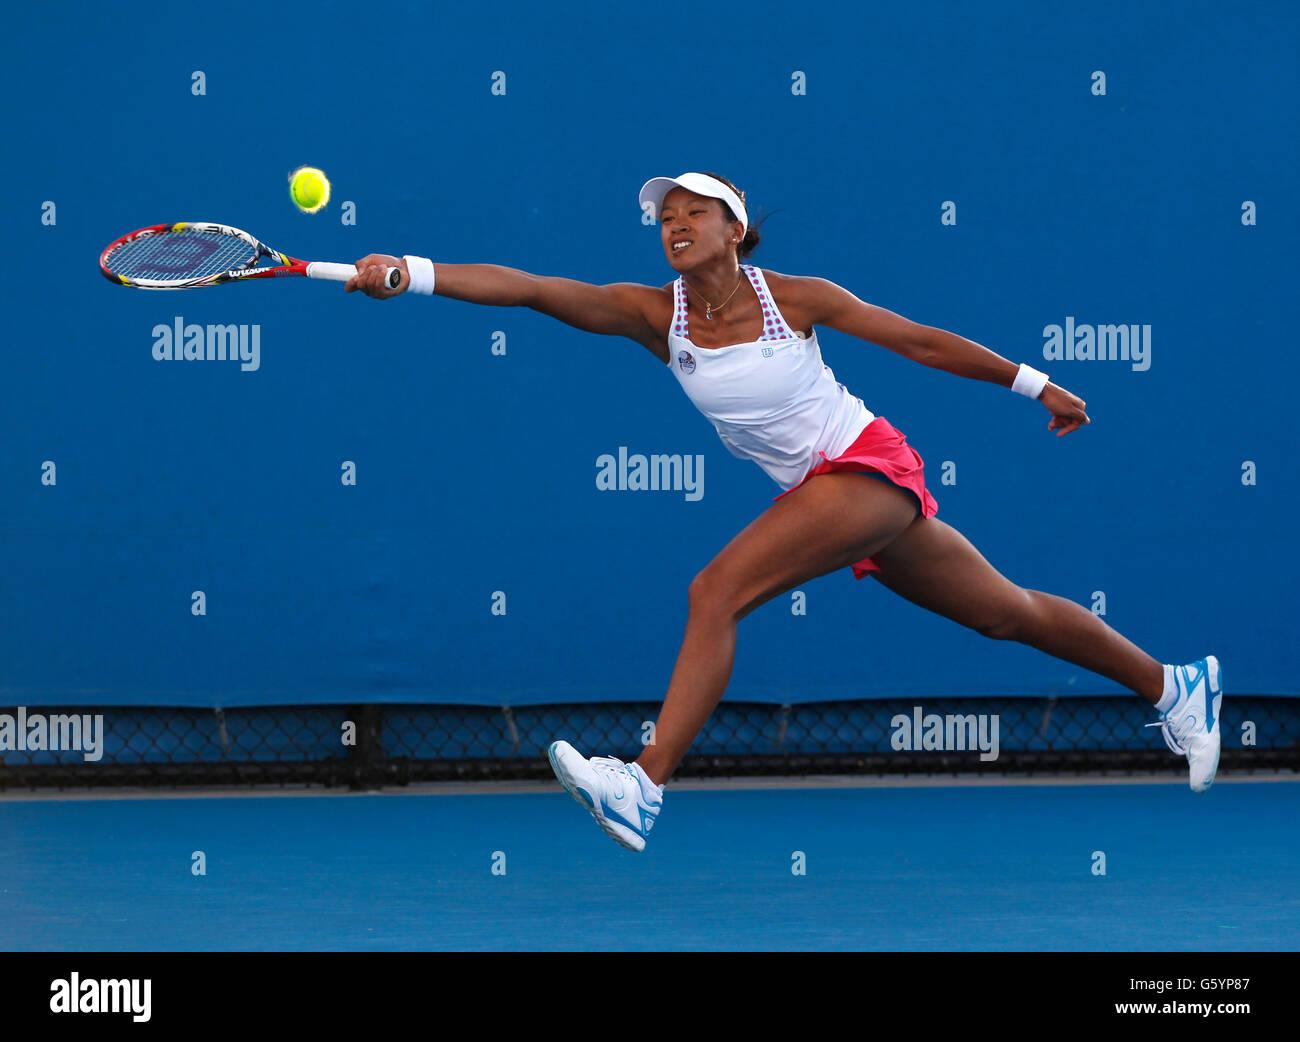 Anne Keothavong, GBR, Australian Open 2012, ITF Grand Slam Tennis Tournament, Melbourne Park, Melbourne, Victoria, Stock Photo